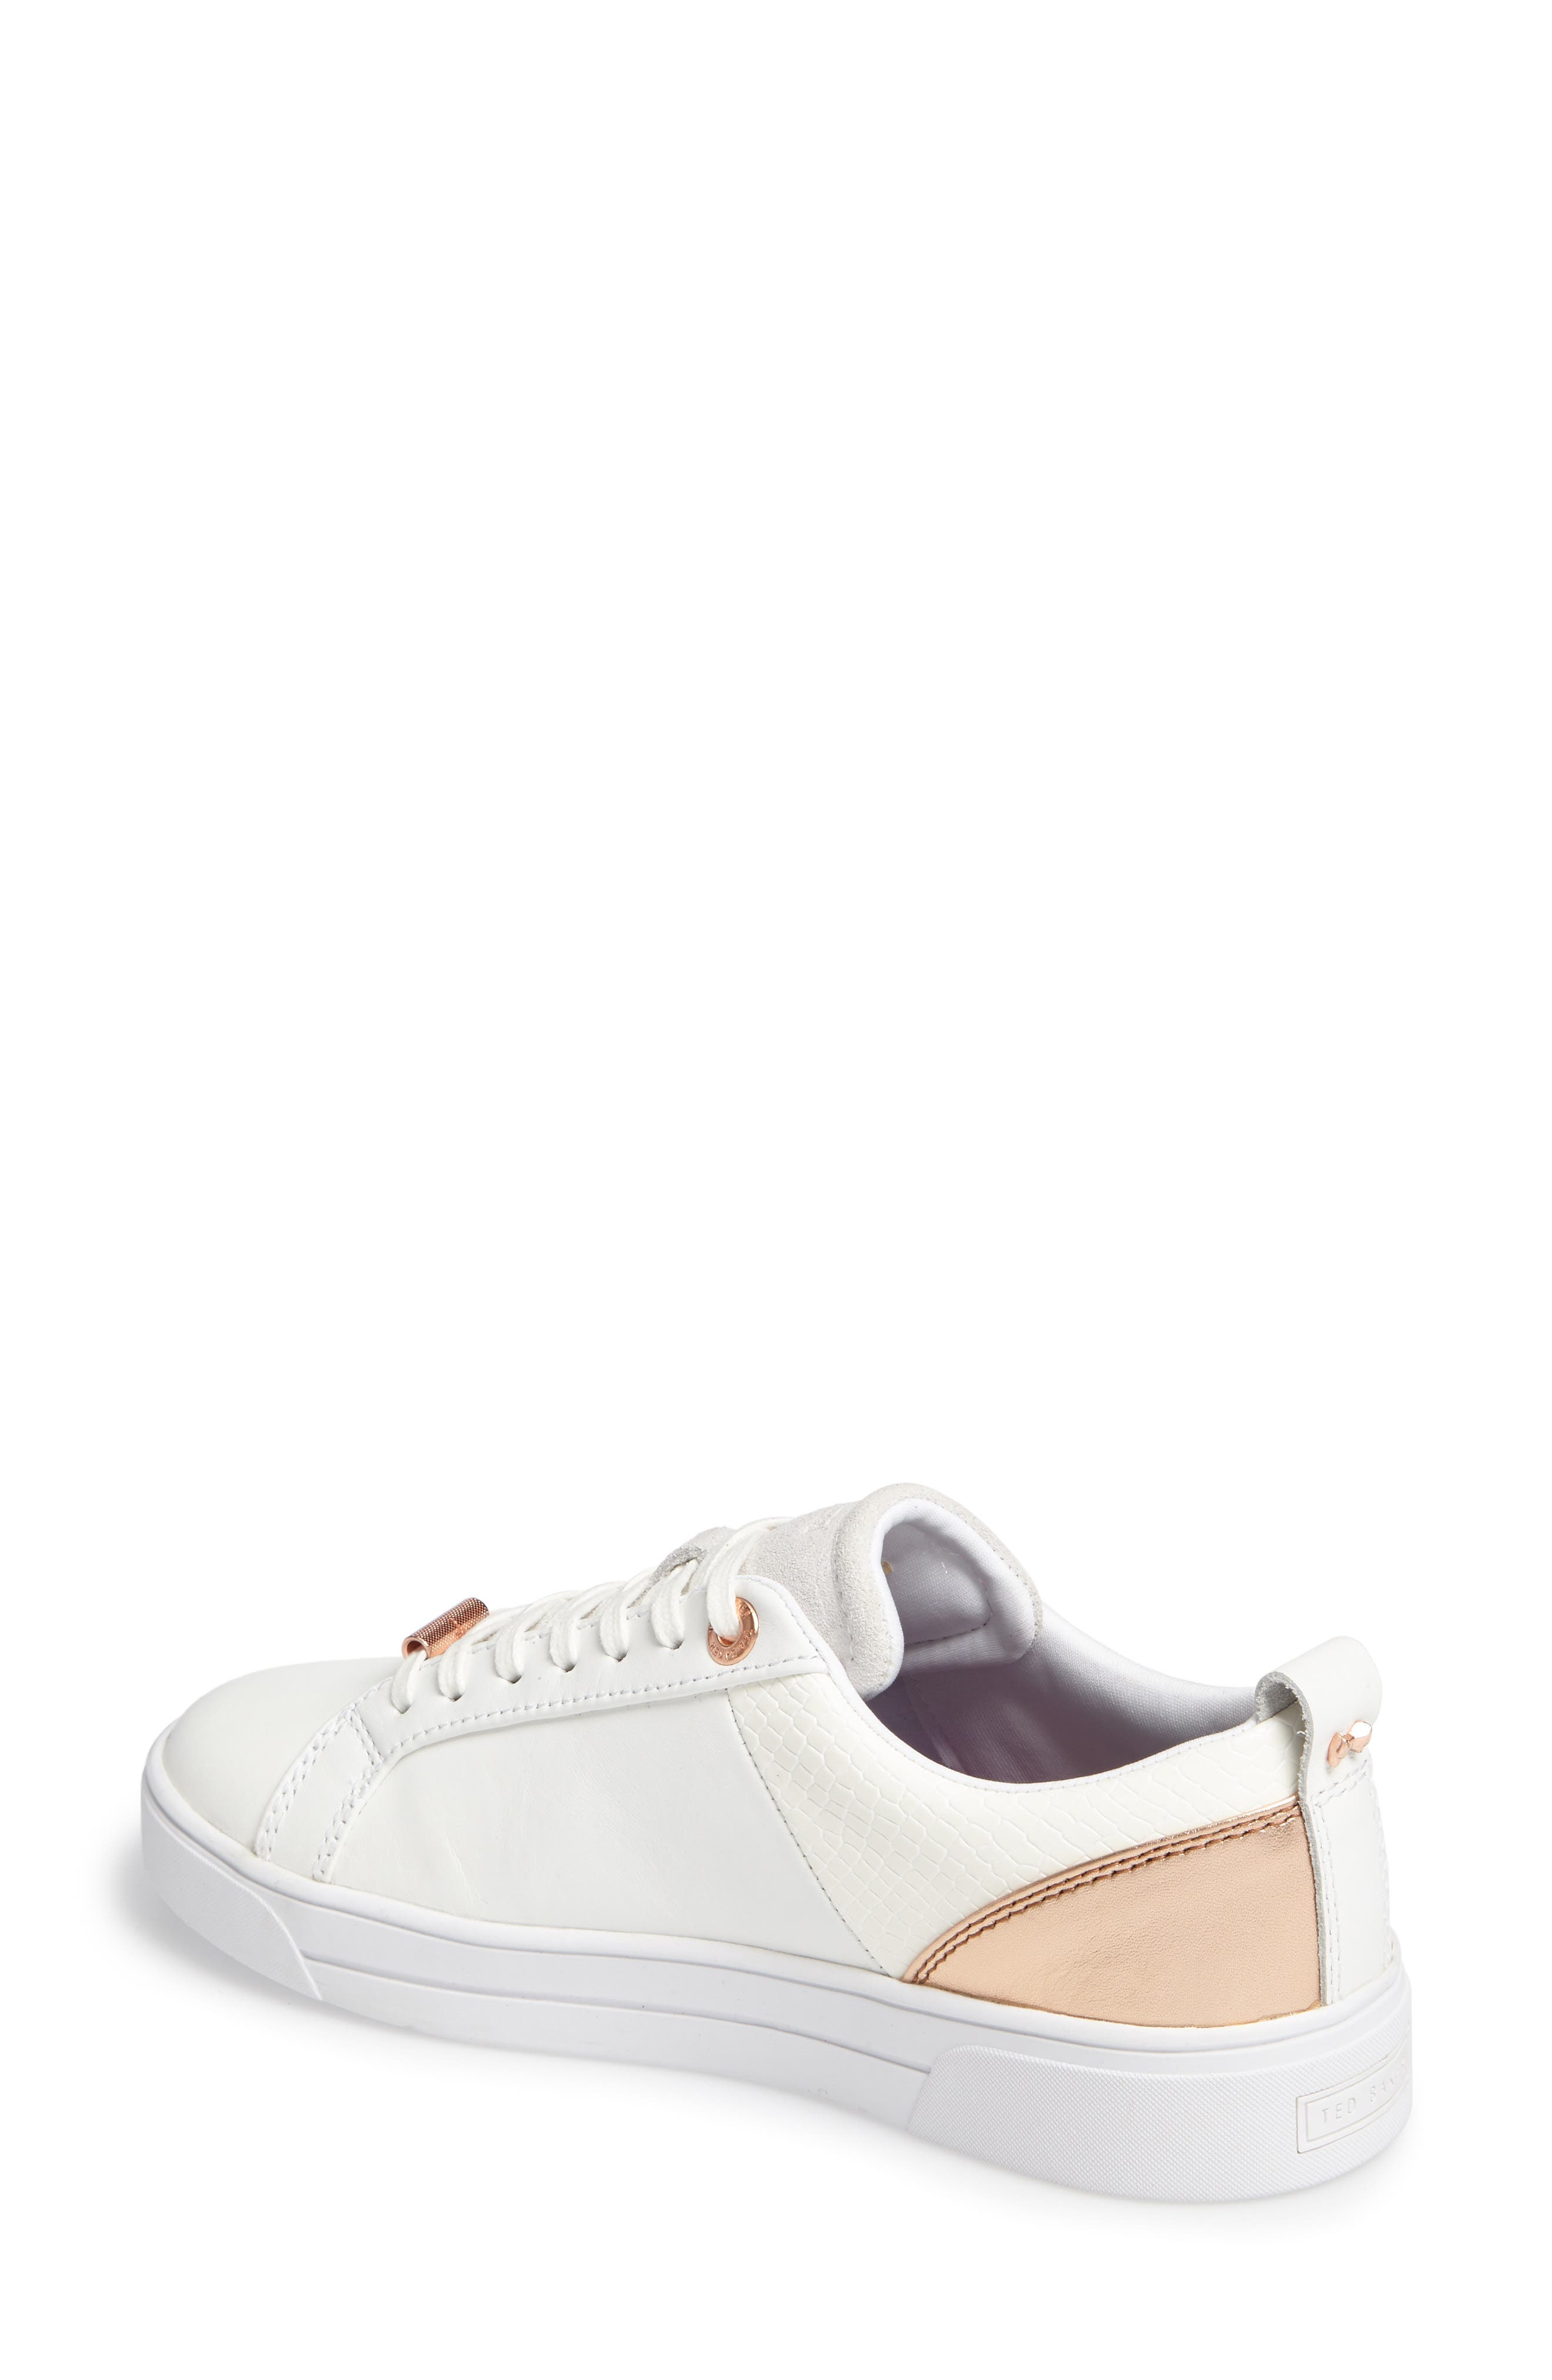 Kulei Lace-Up Sneaker,                             Alternate thumbnail 3, color,